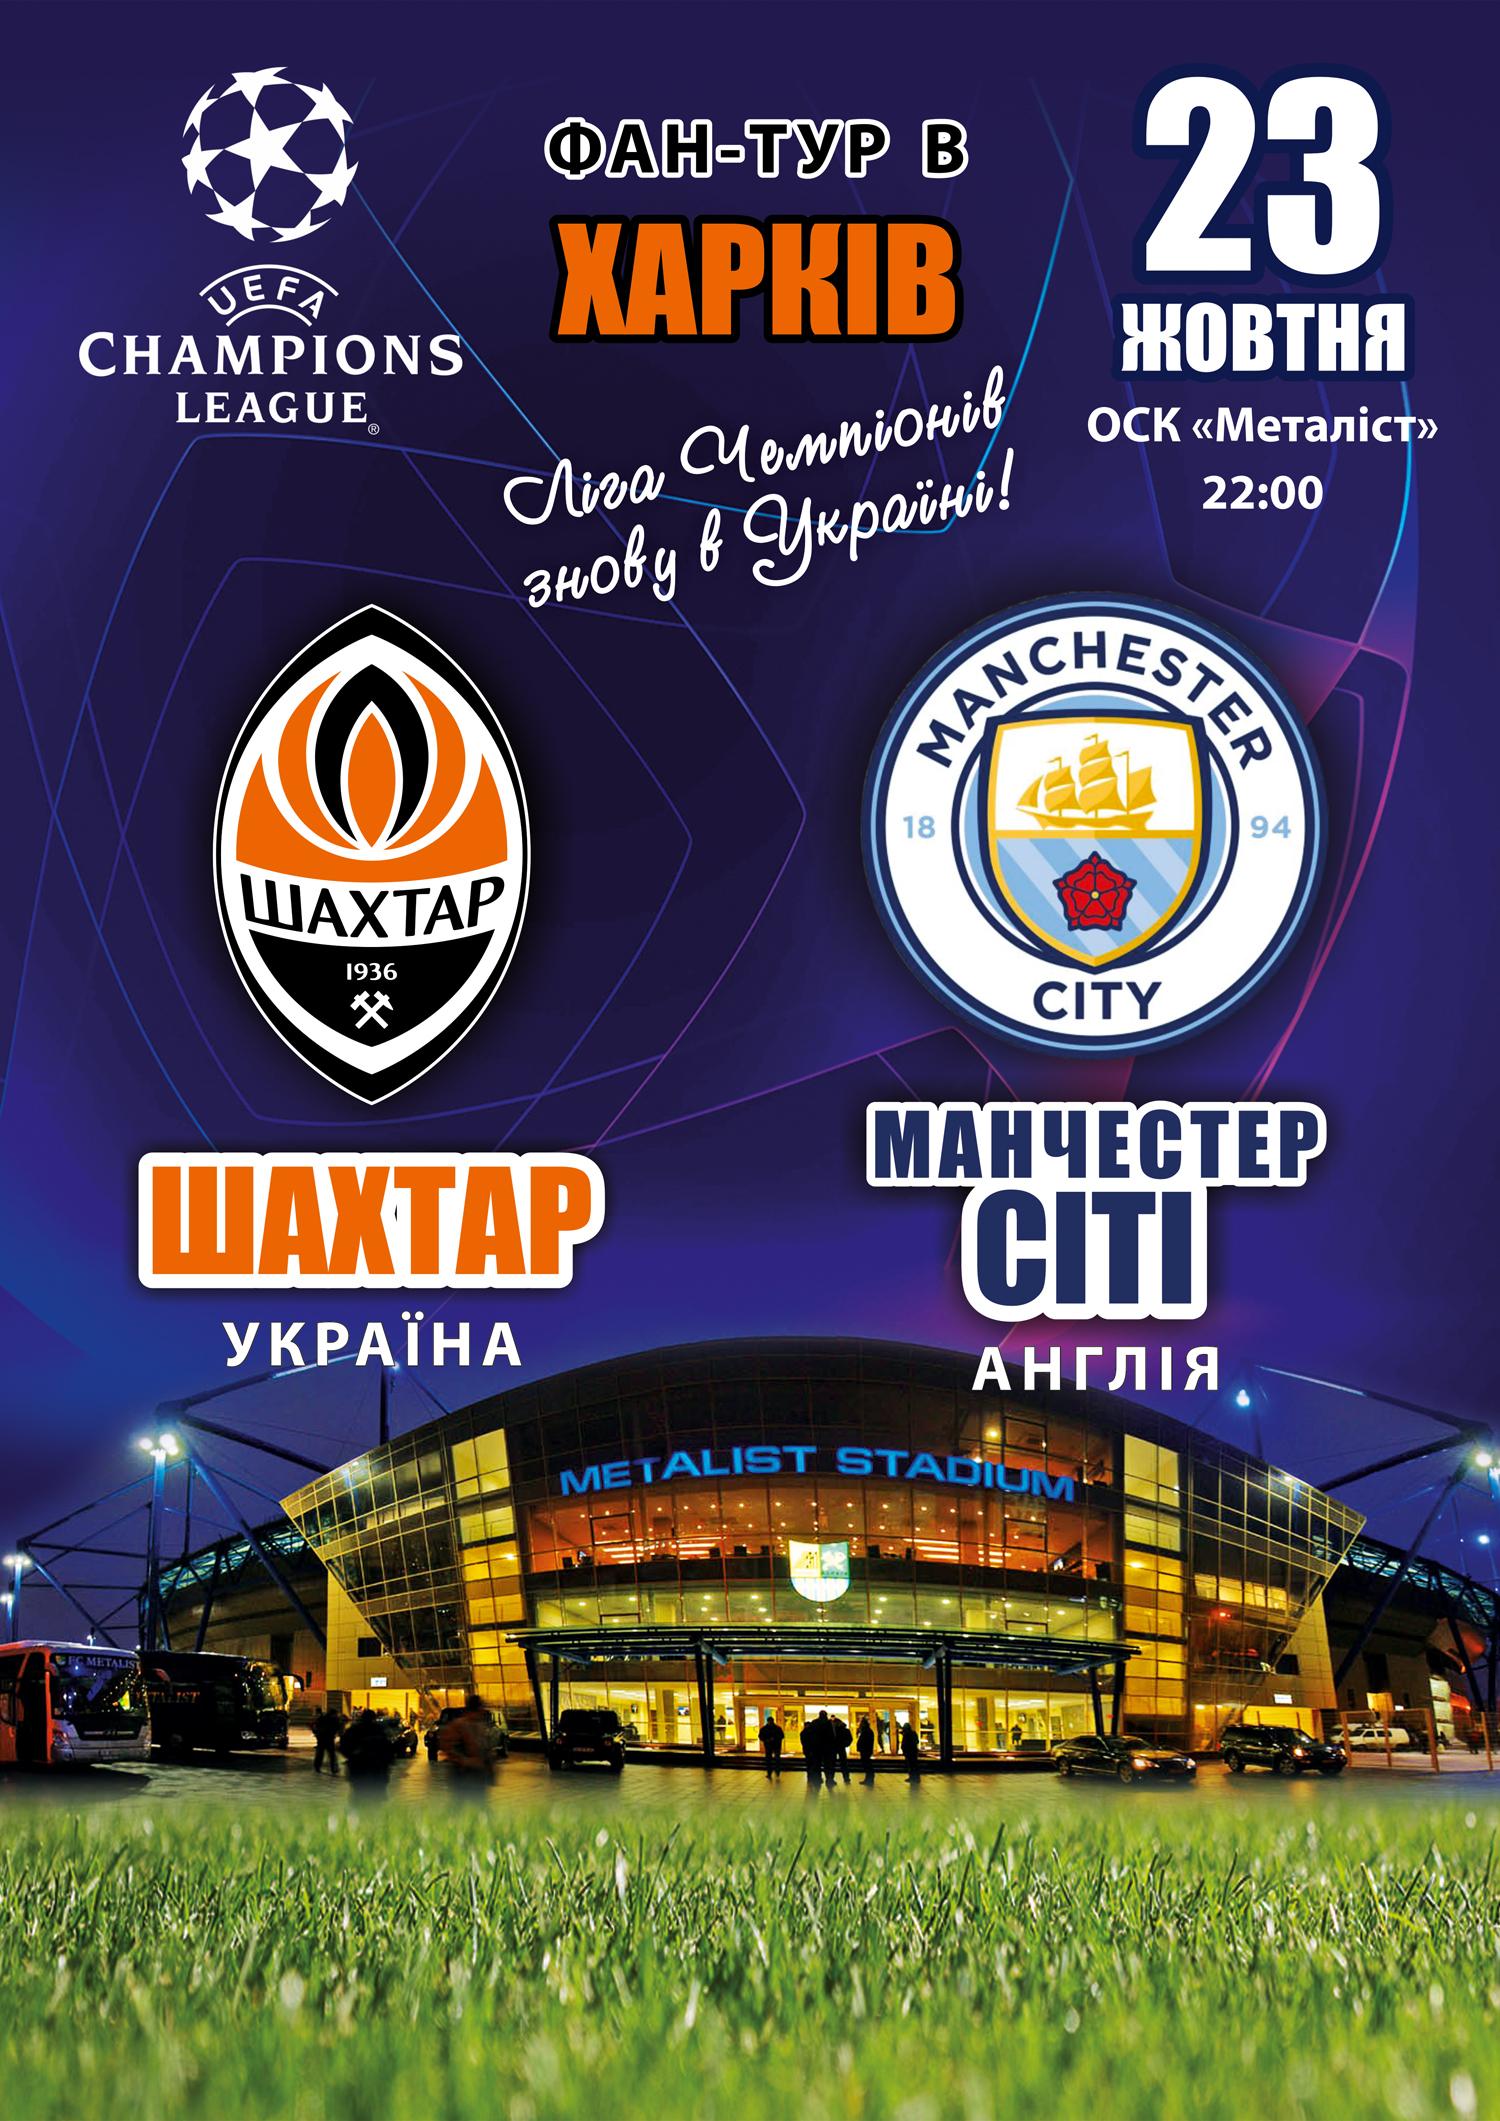 Фан-тур на матч Лиги Чемпионов Шахтер–Манчестер Сити (Черкассы)